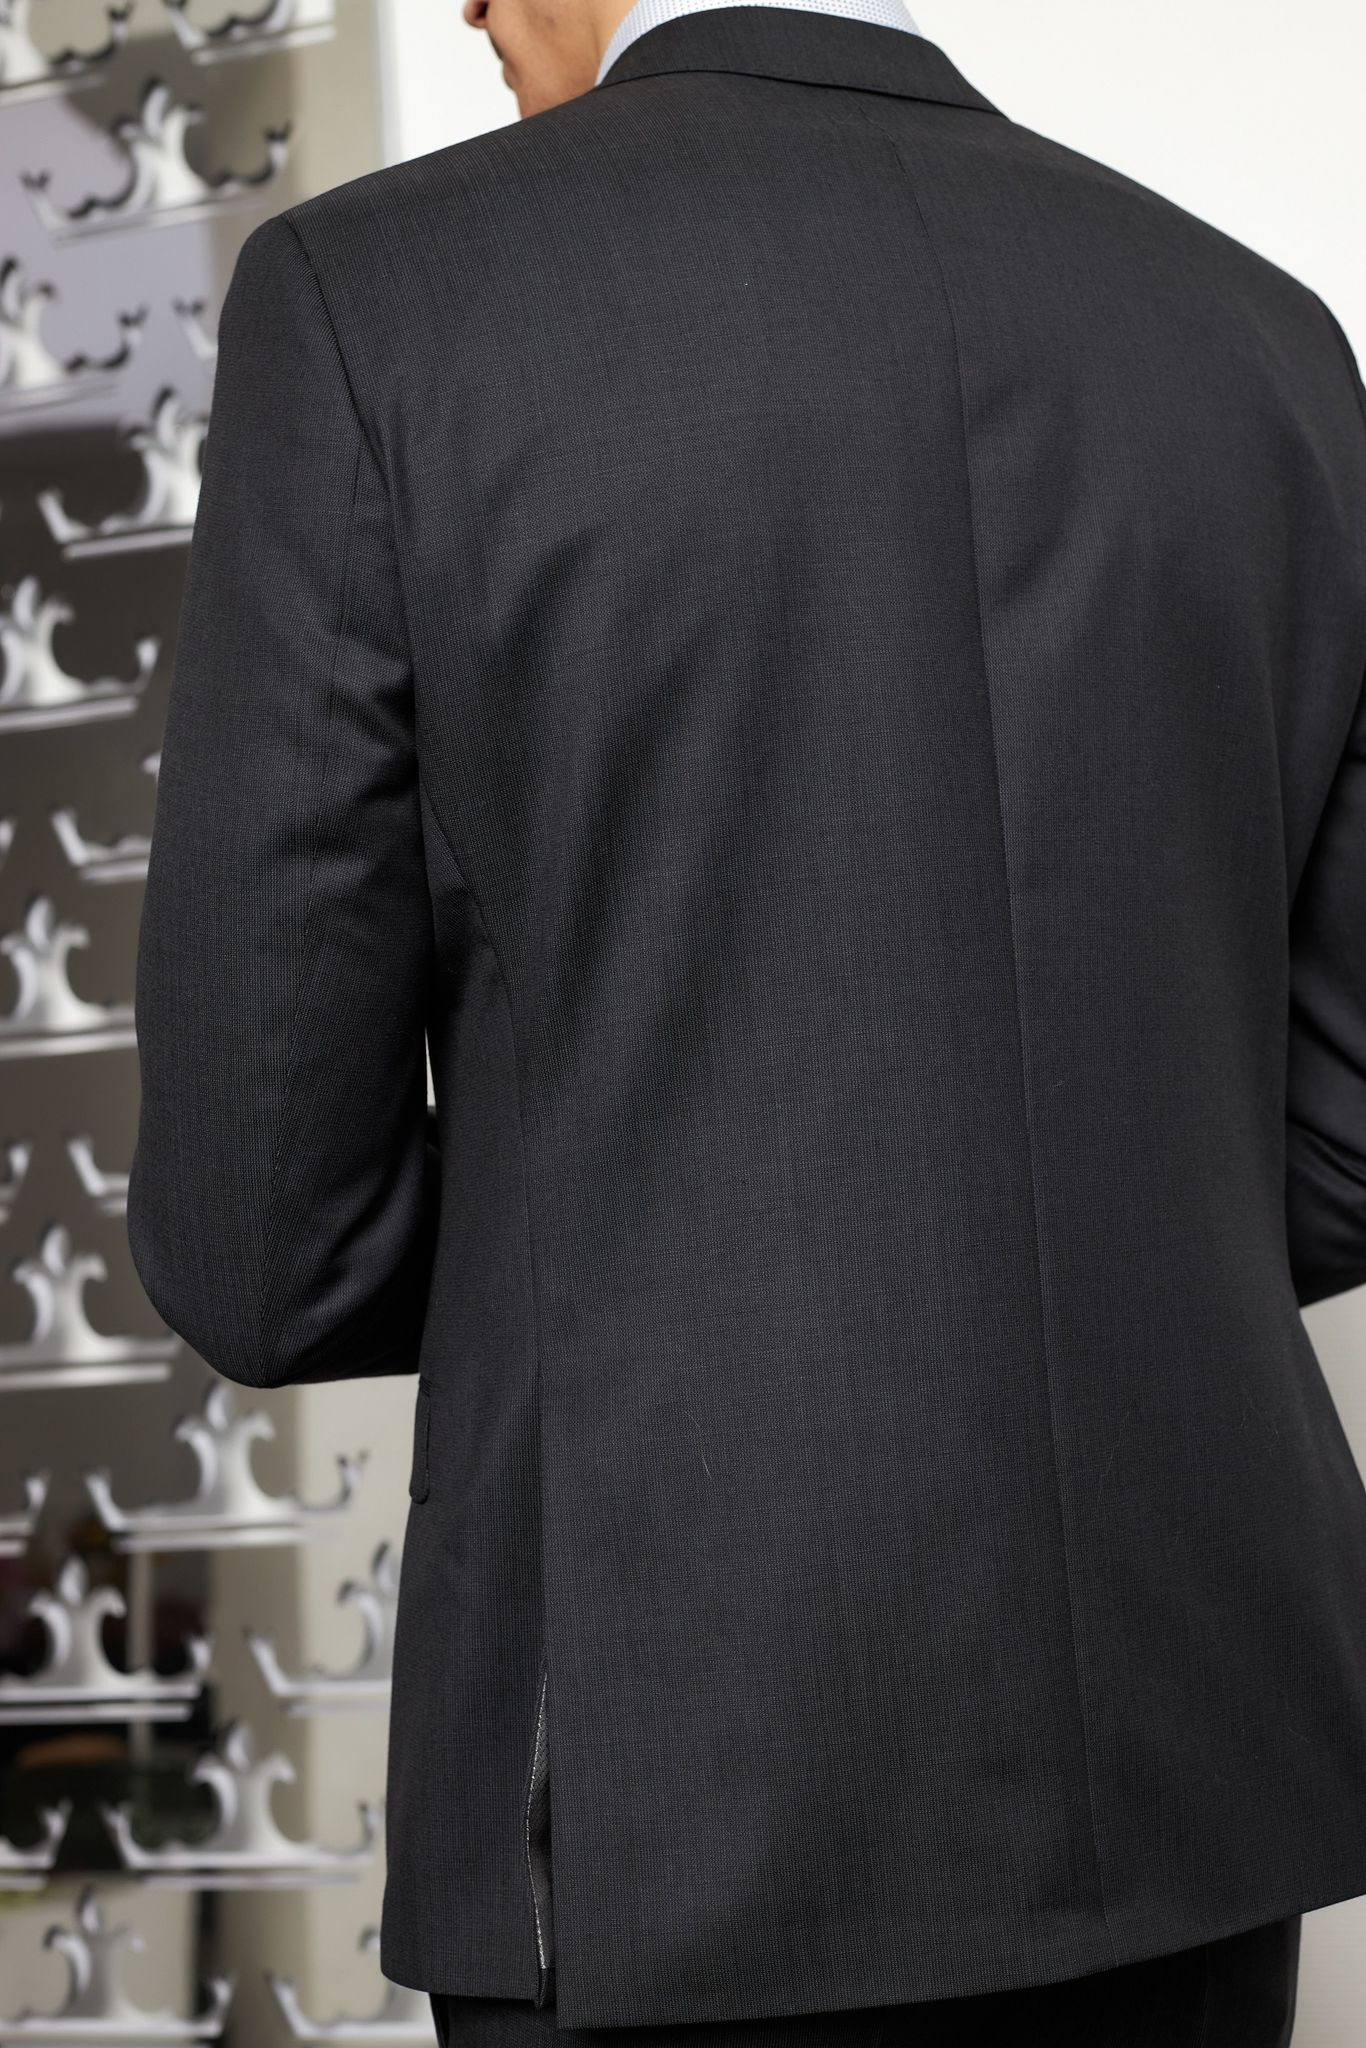 ROY ROBSON Костюм в мелкую выработку из шерсти Angelico Super 100'S